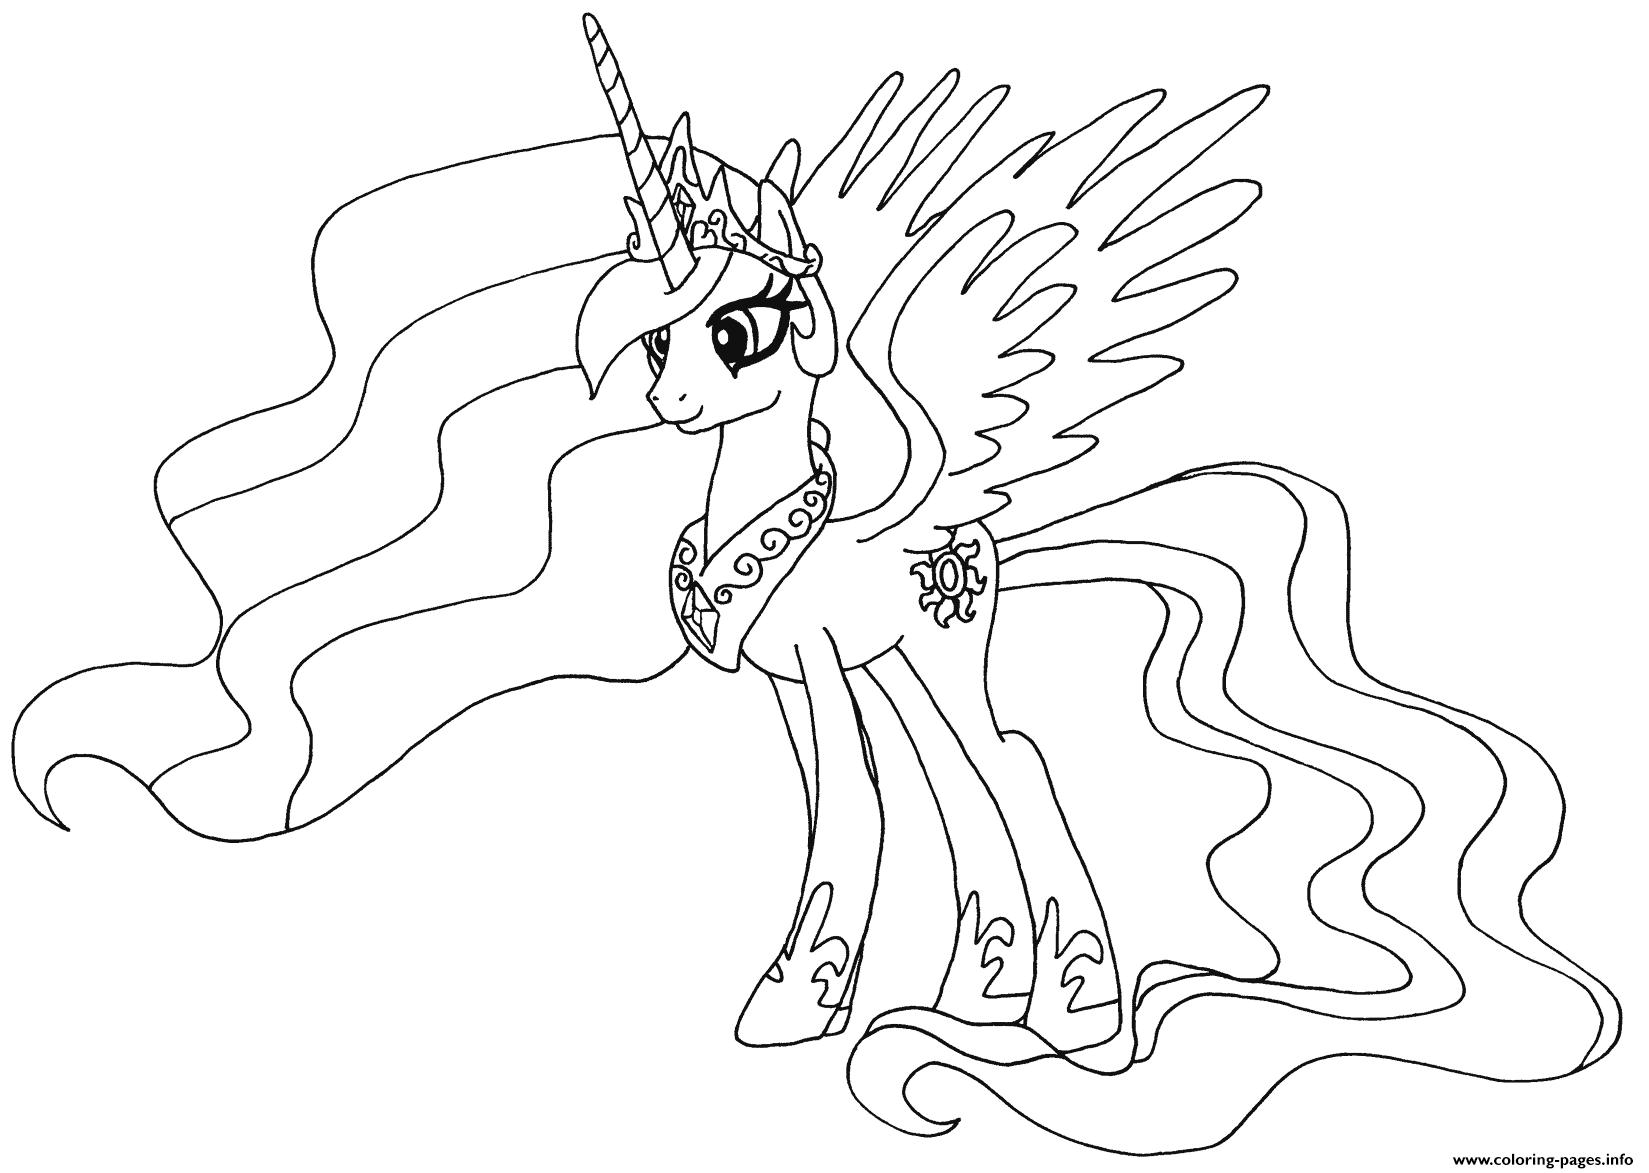 Print Princess Celestia My Little Pony Coloring Pages My Little Pony Coloring My Little Pony Printable Cartoon Coloring Pages